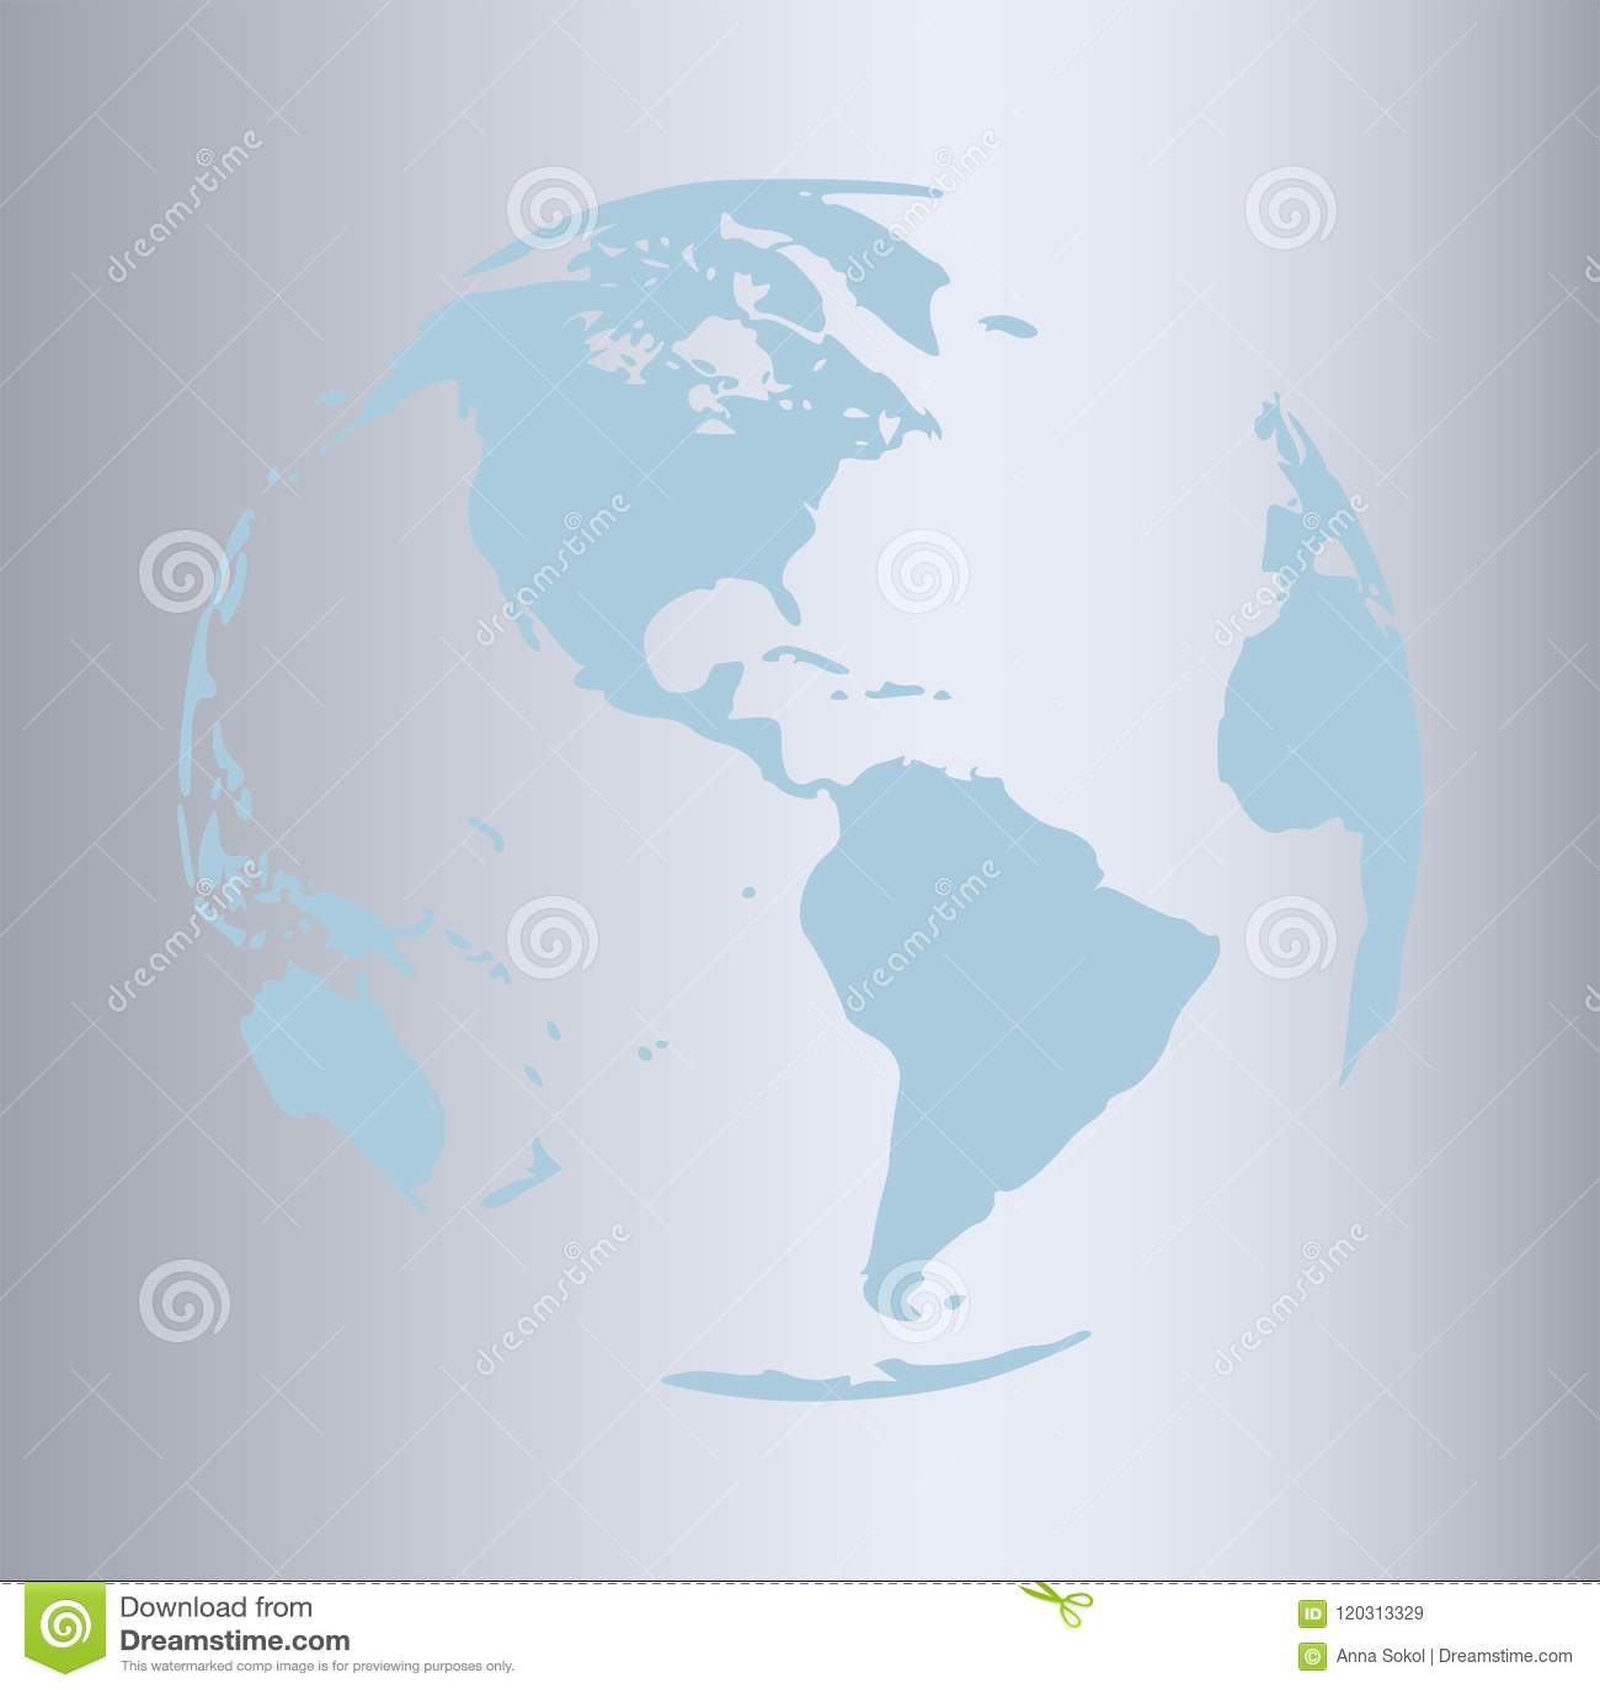 Gold world map design stock vector illustration of banner 120313329 gold world map design gumiabroncs Images